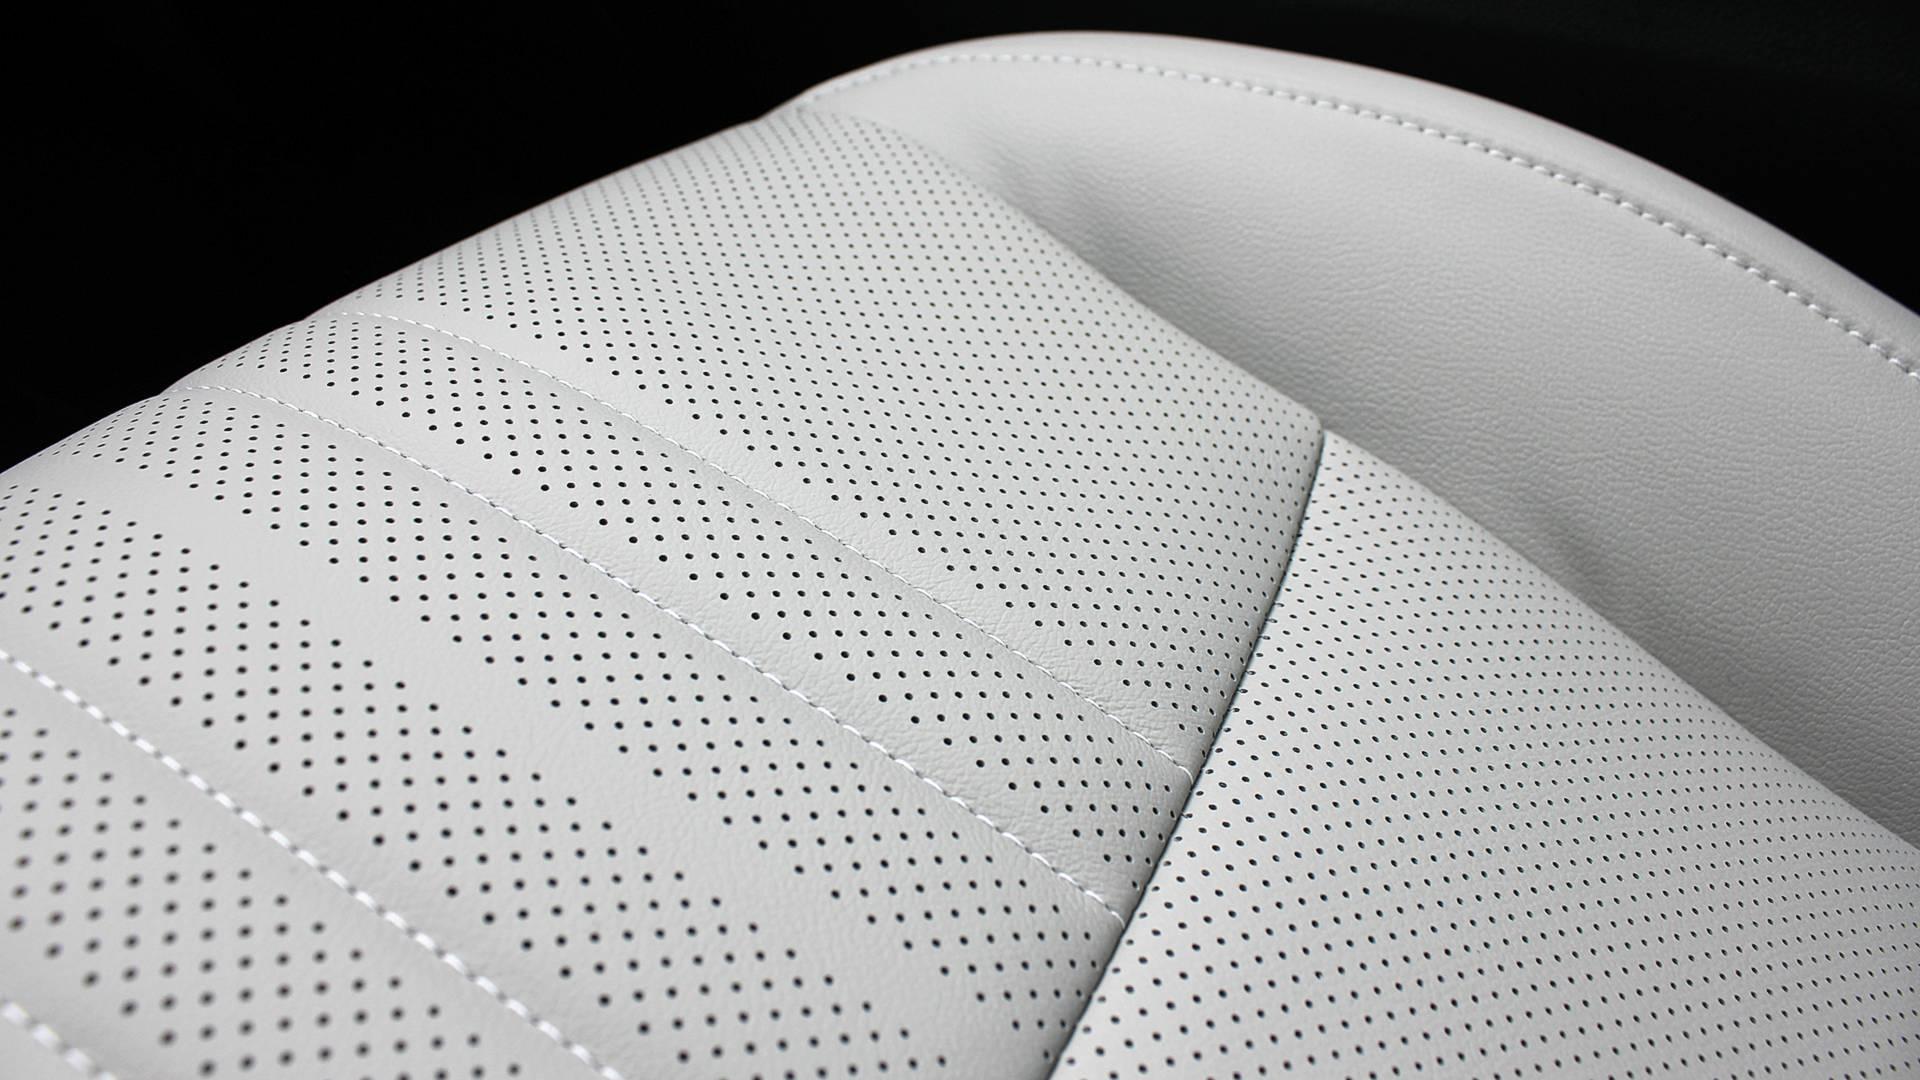 2018-honda-accord-hybrid-danh-gia-14.jpg